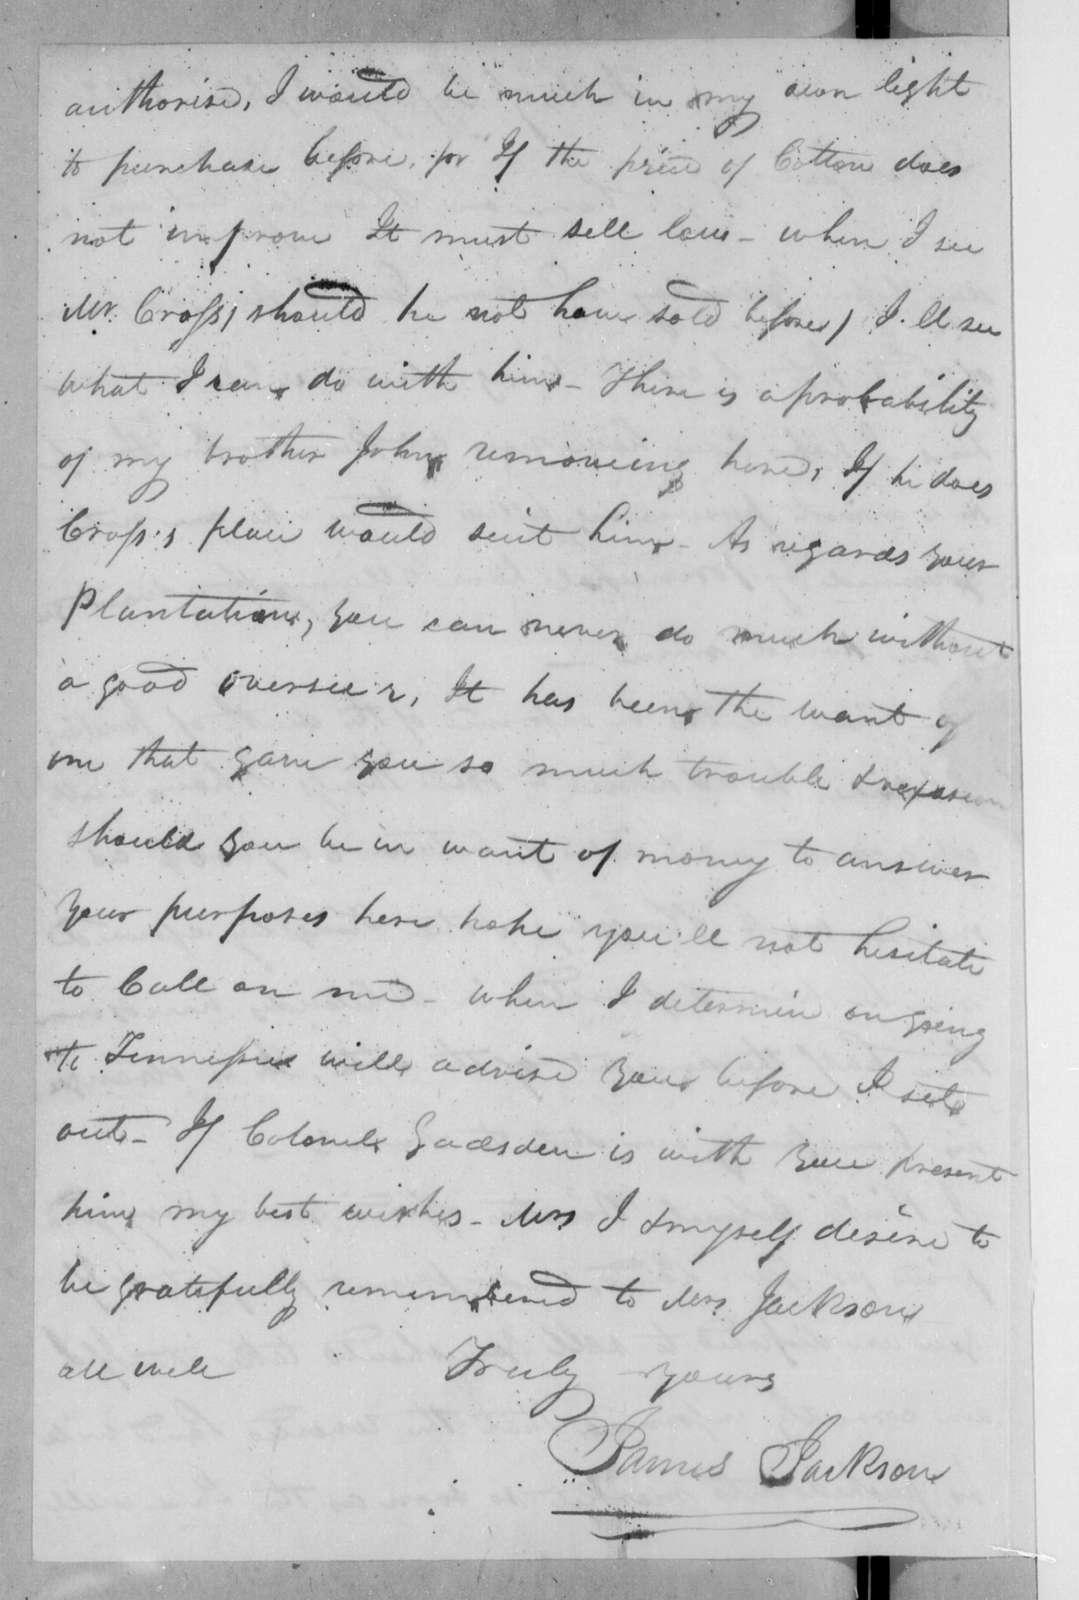 James Jackson to Andrew Jackson, September 30, 1822